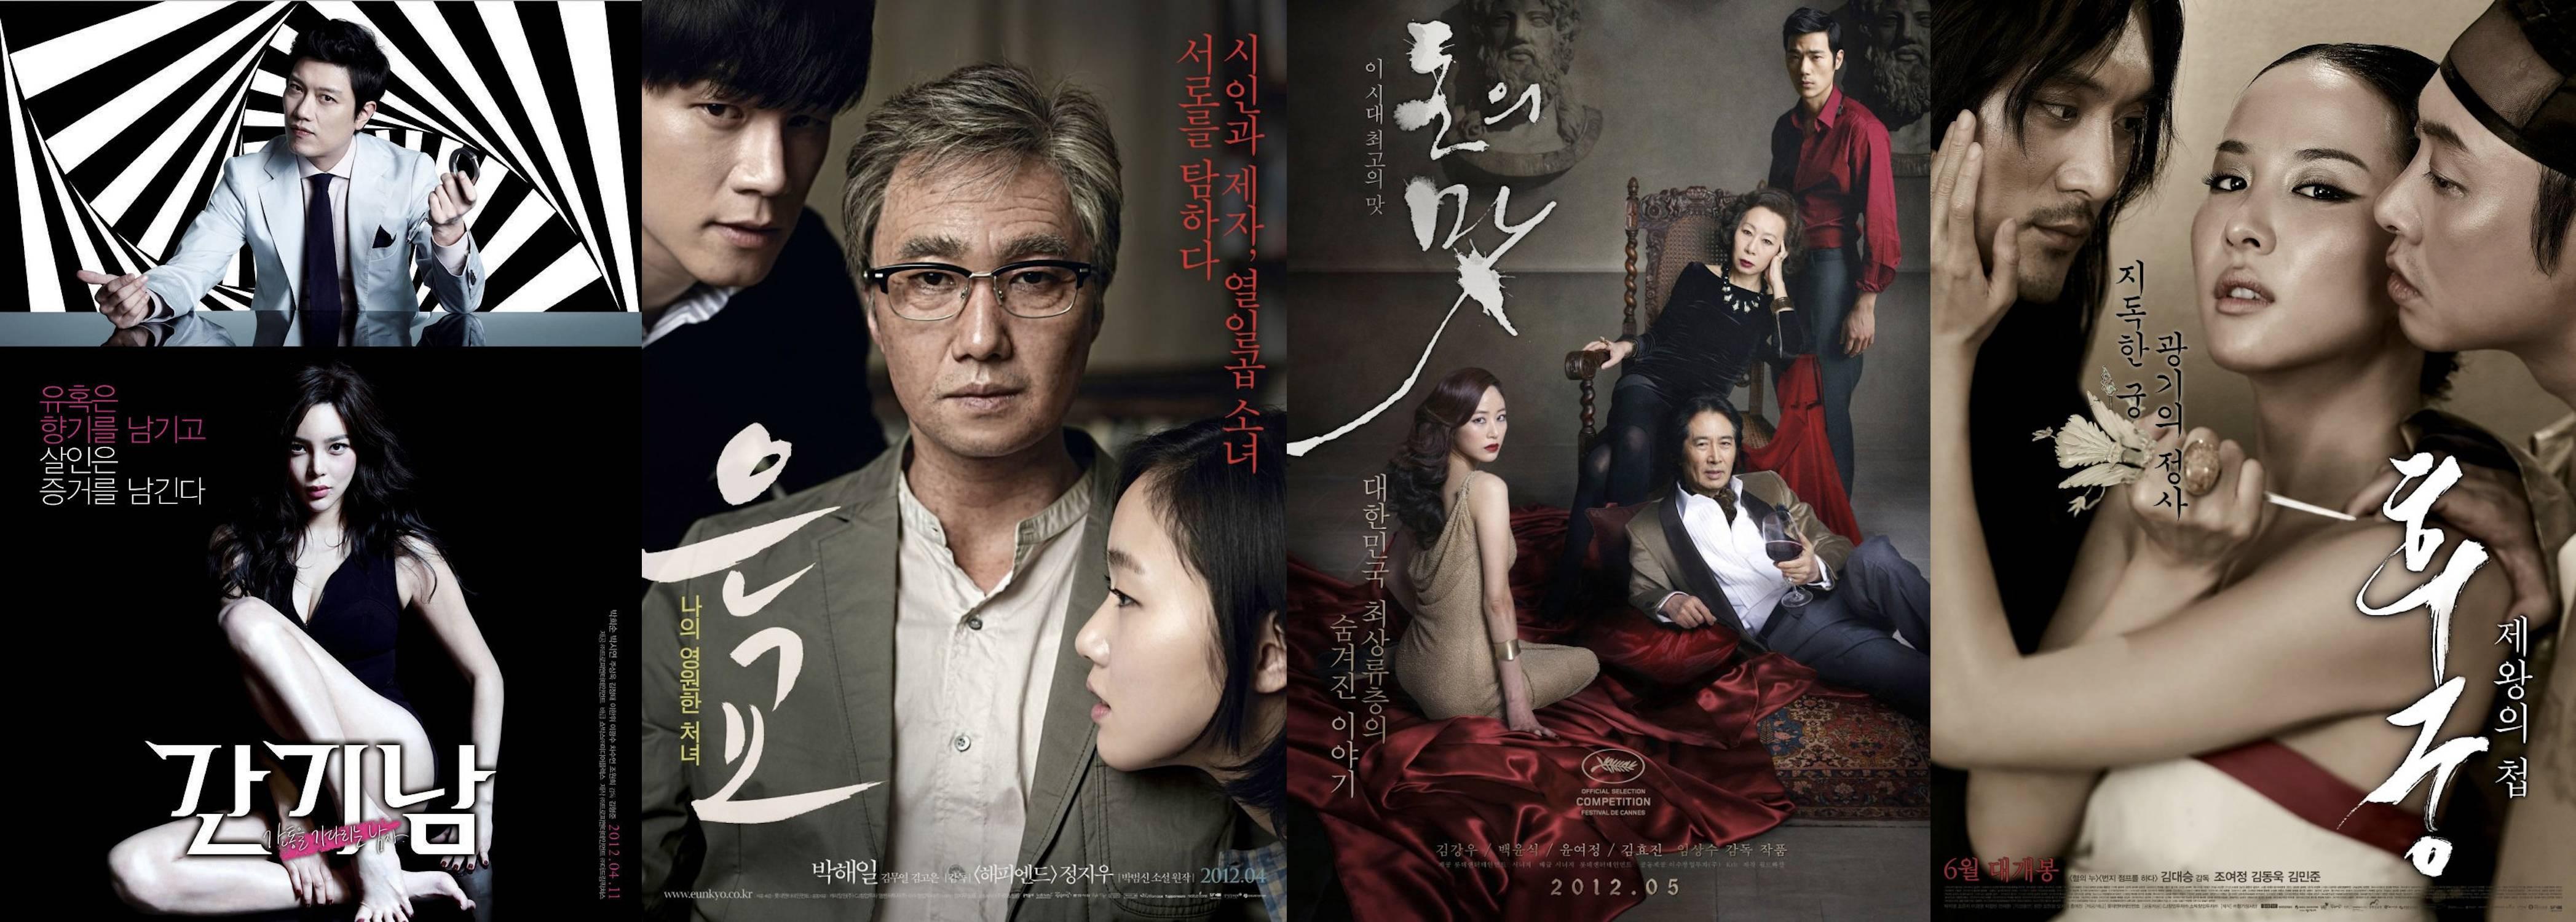 Film Korea Hot Movie Dramas Review Korean Cinema | Holidays OO